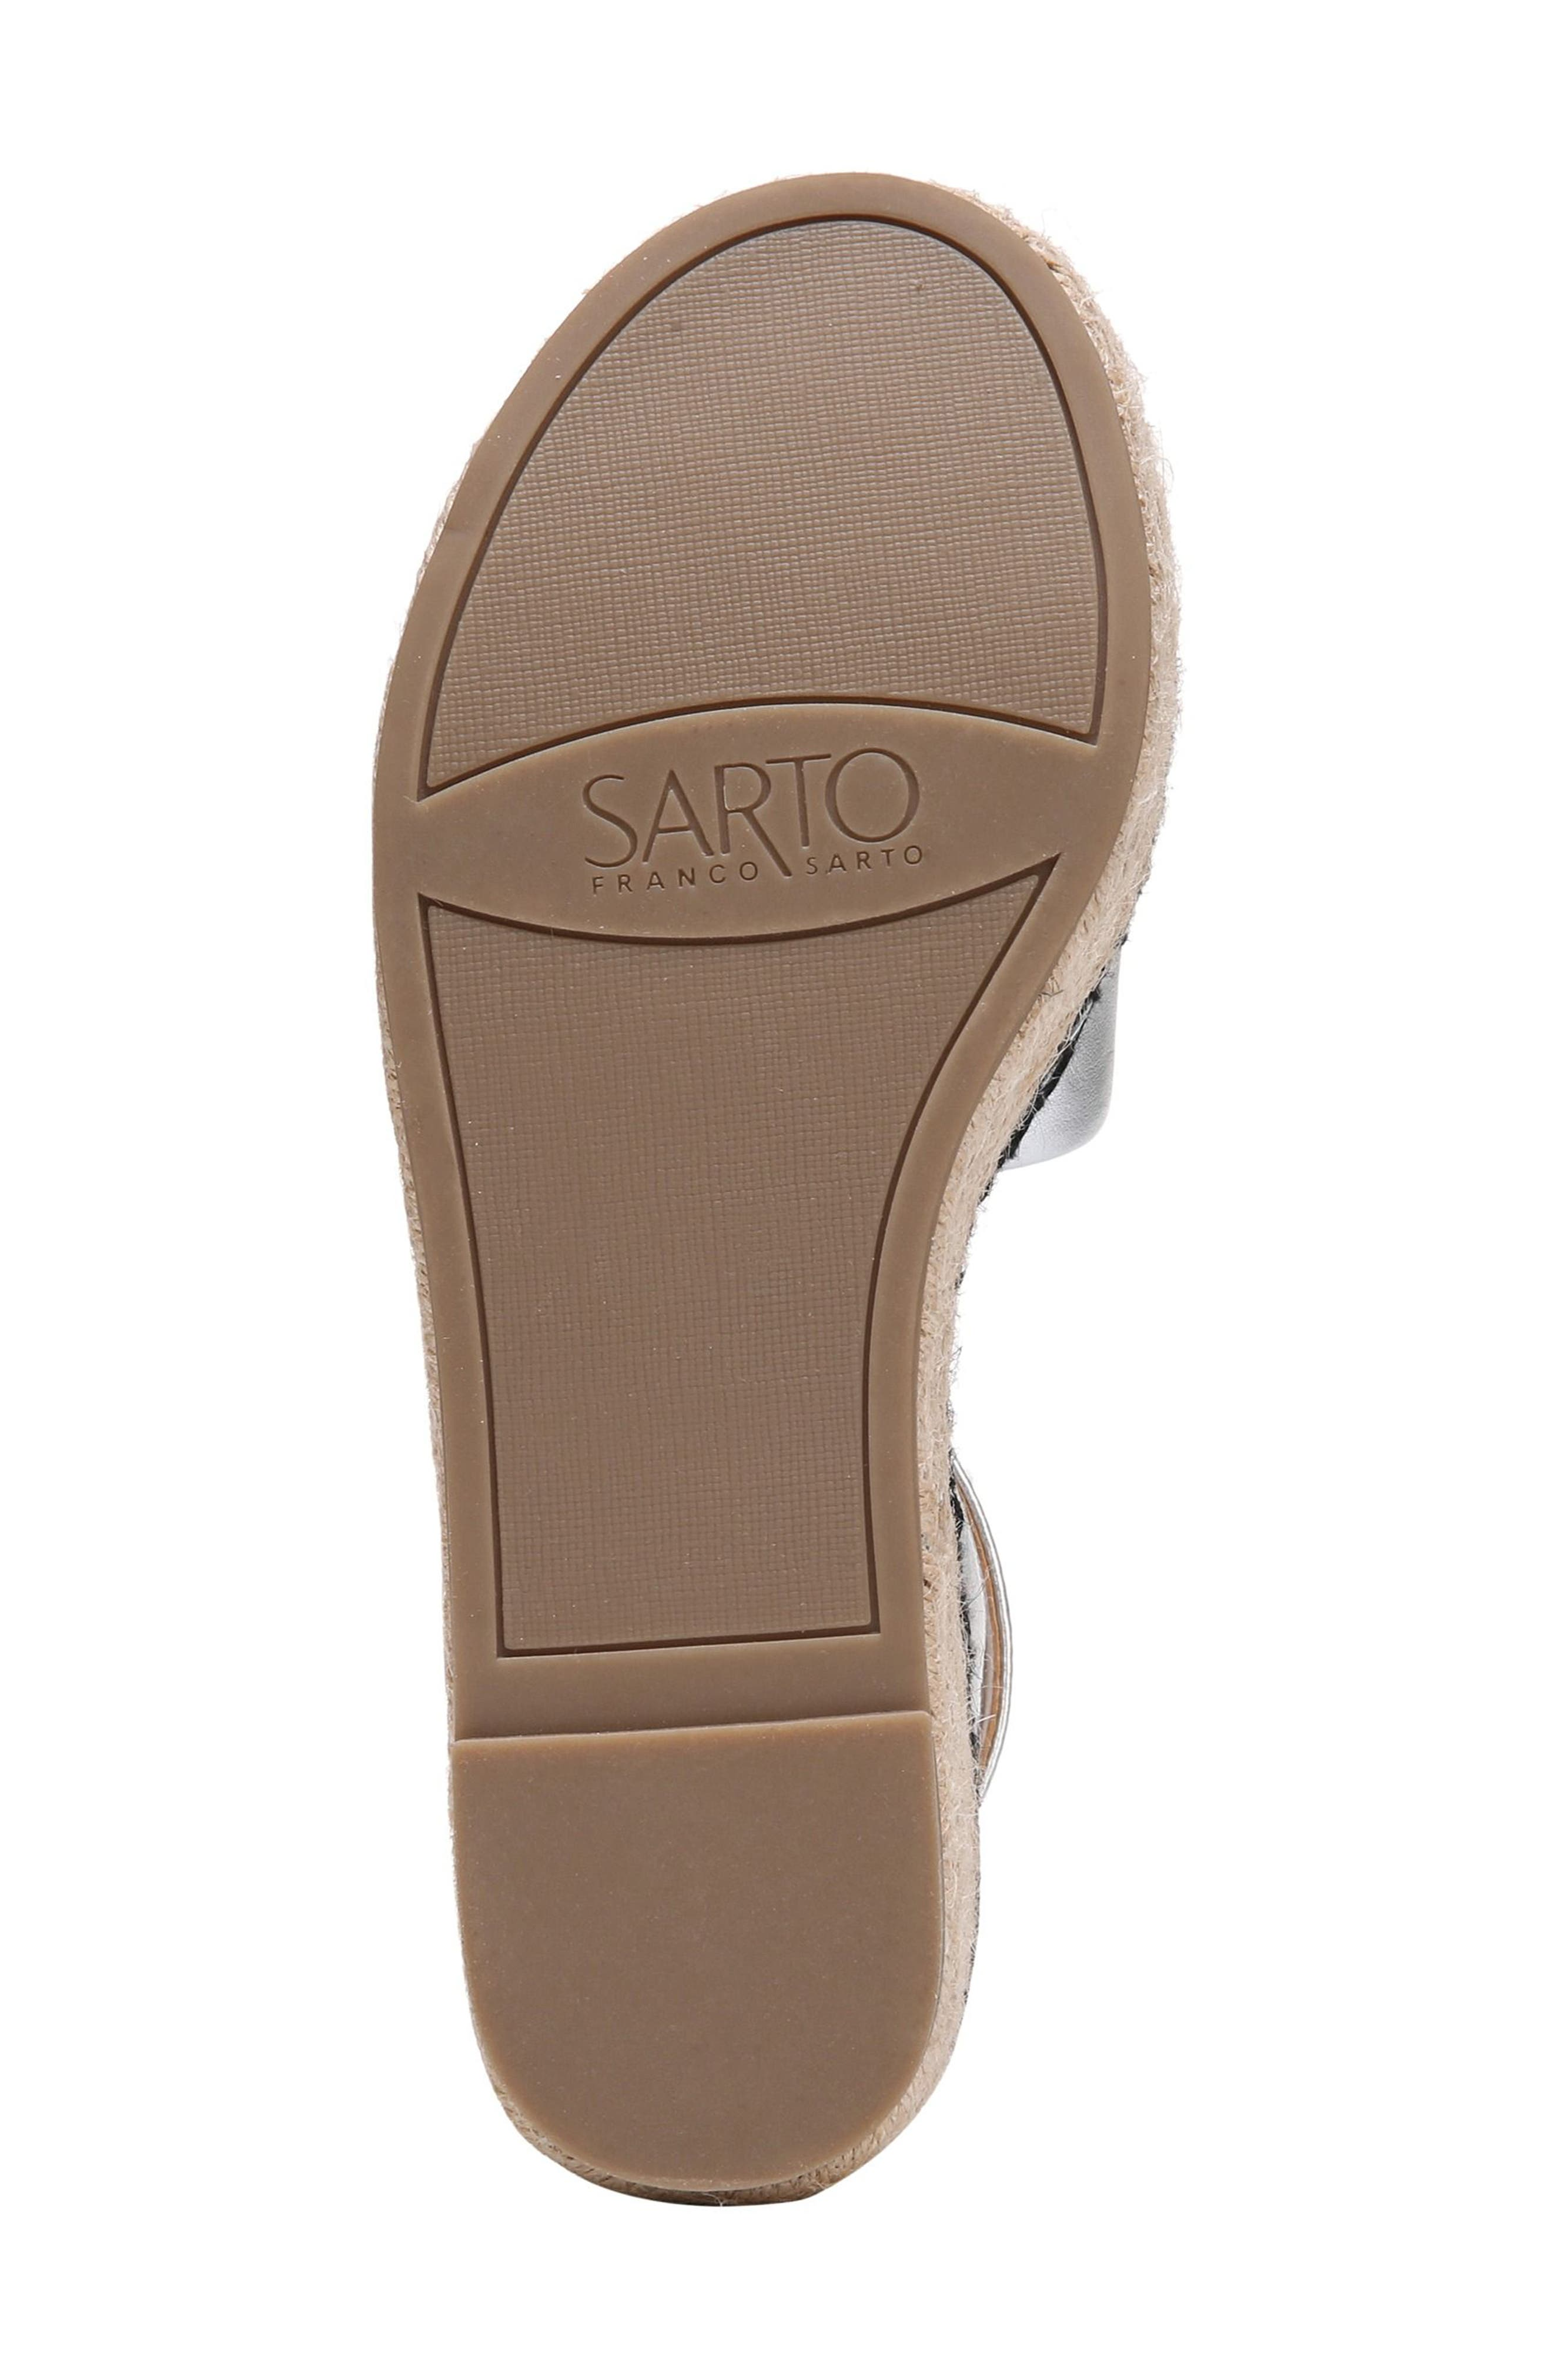 Maisi Platform Espadrille Sandal,                             Alternate thumbnail 6, color,                             Silver Leather